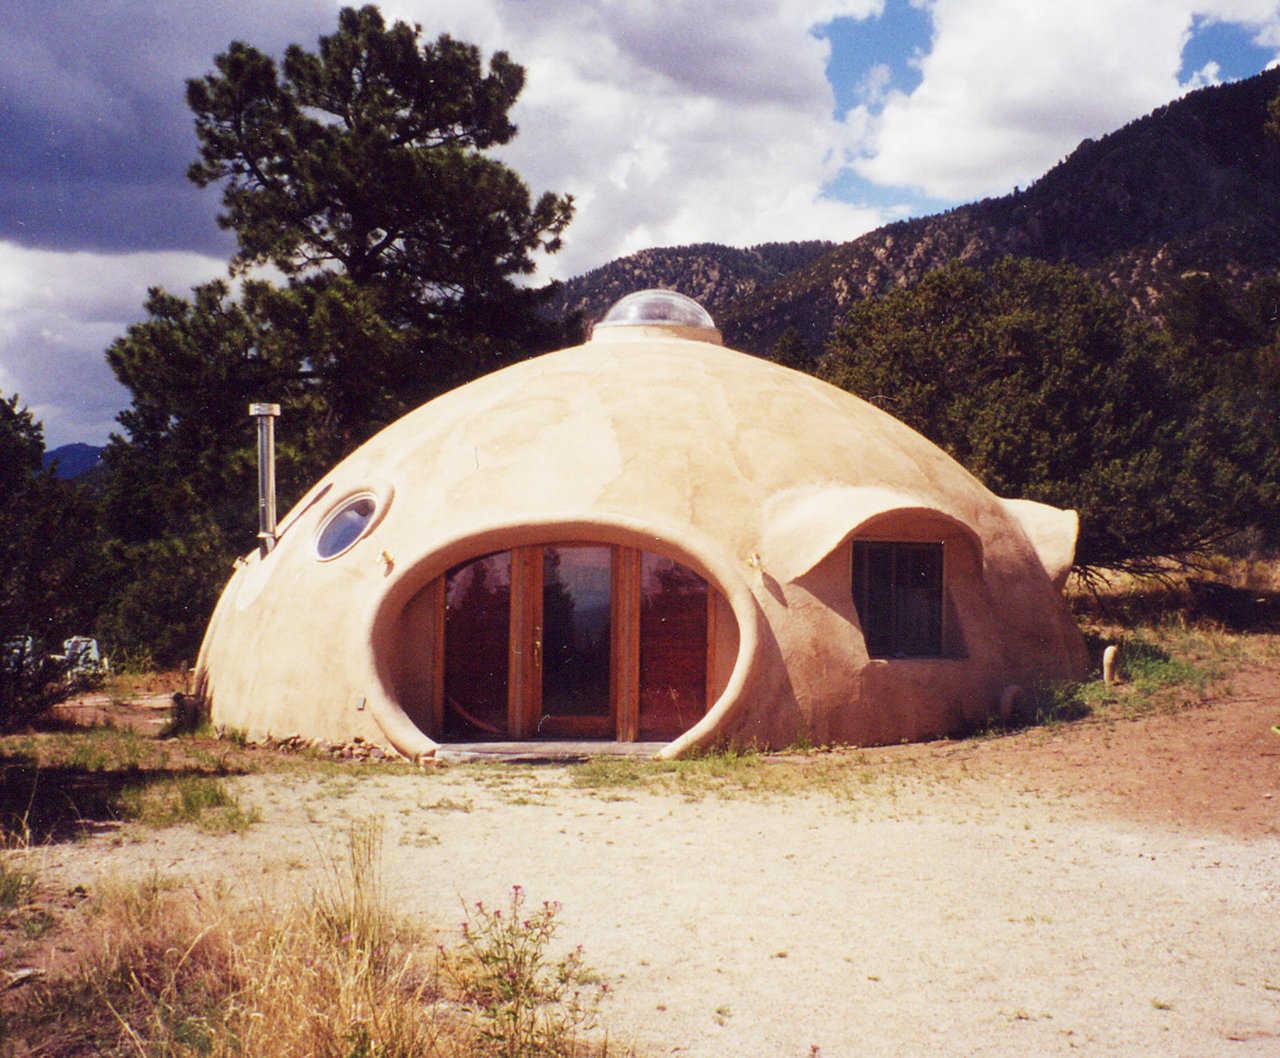 Ananur S Monolithic Dome Home Monolithic Dome Institute